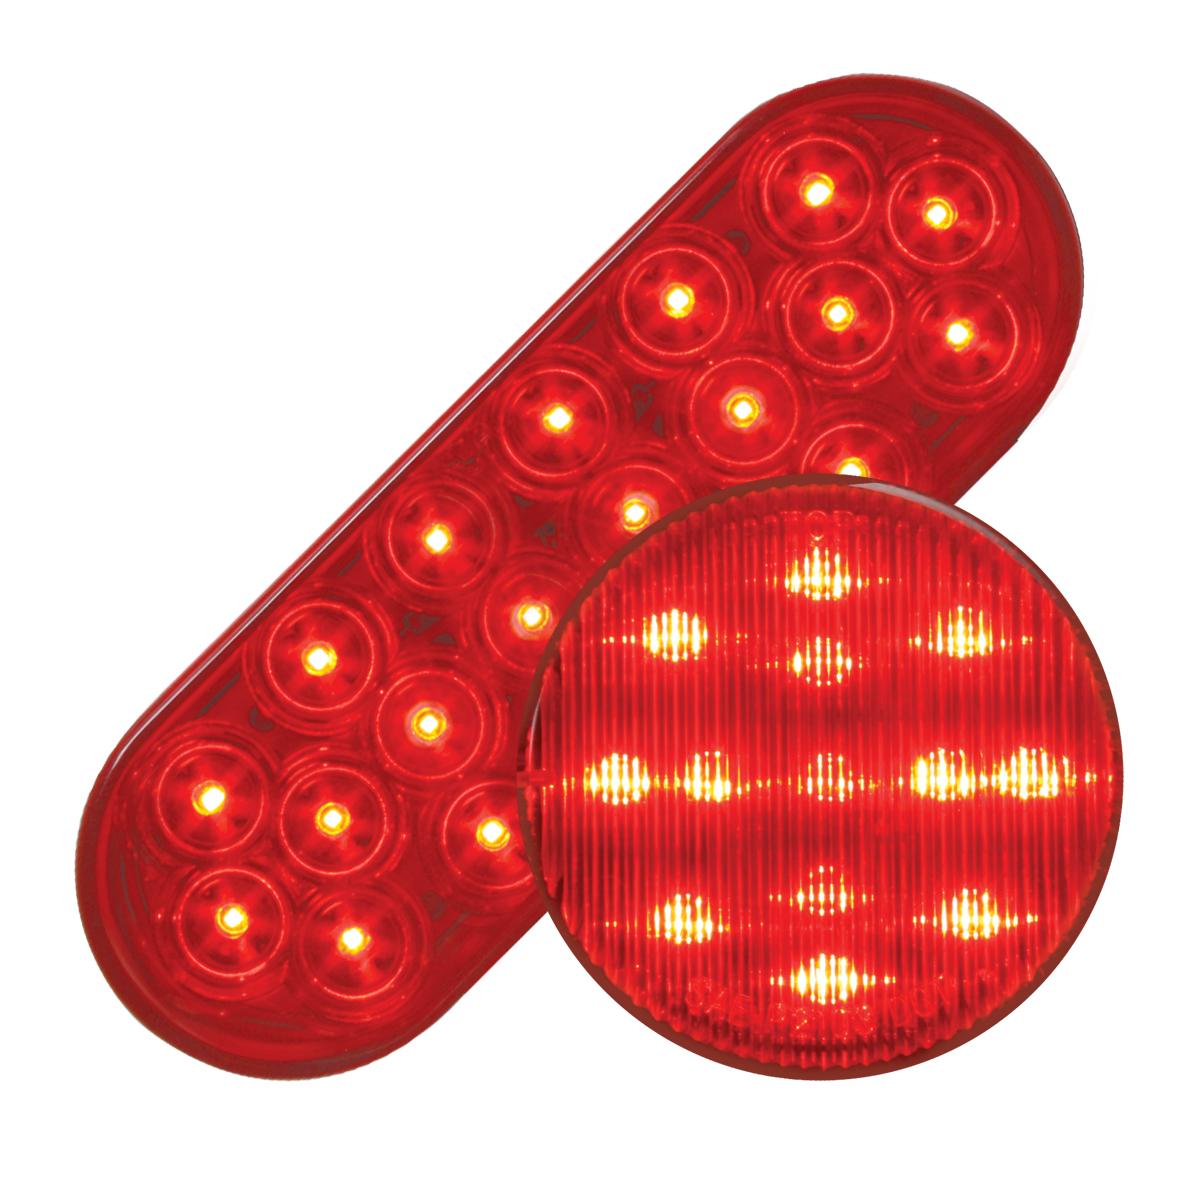 #87721/#79281 Fleet LED Flat - Red/Red